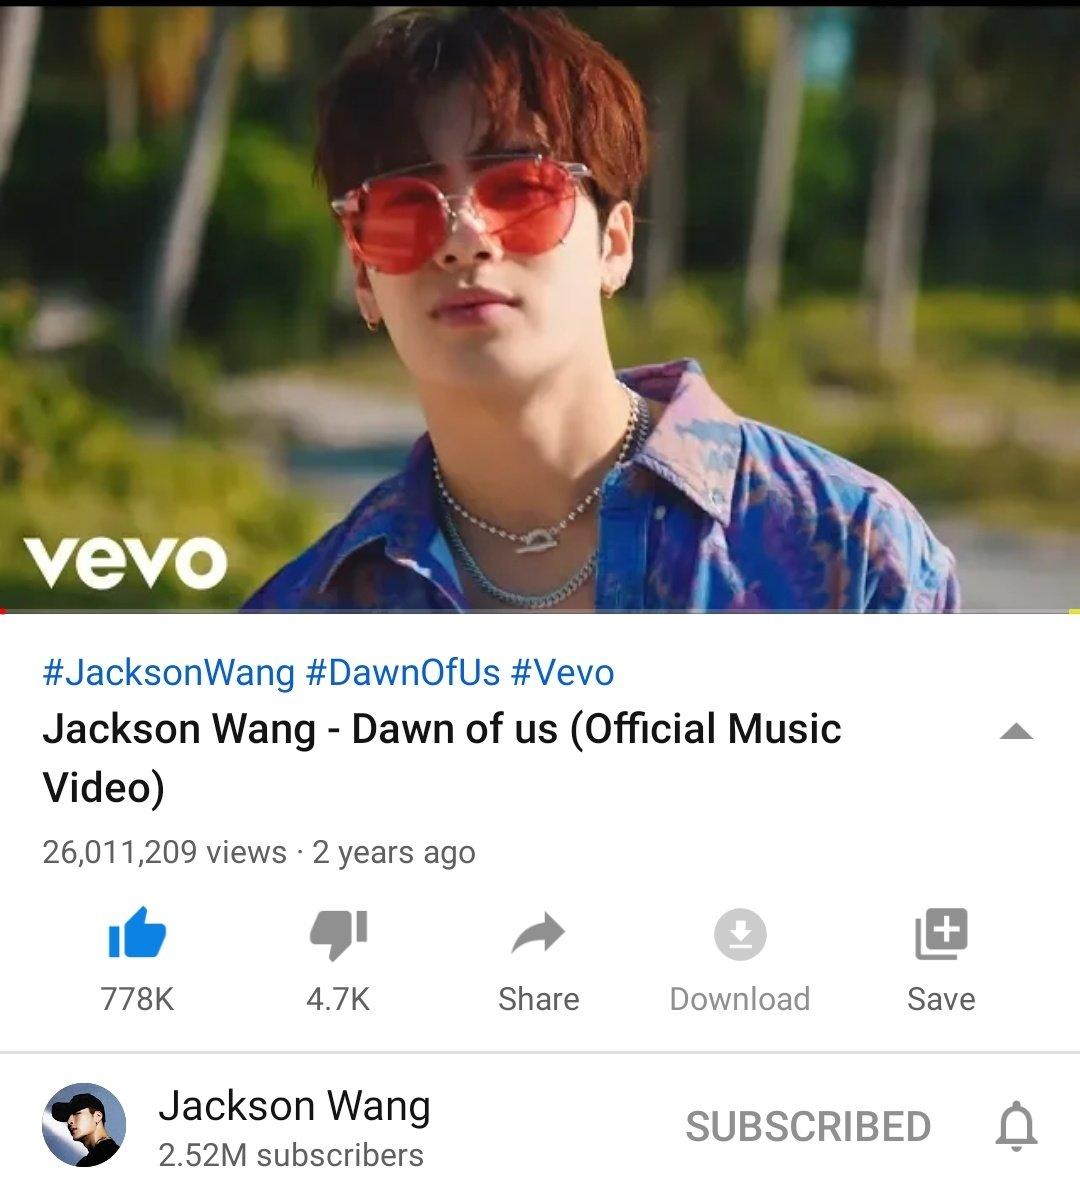 Jackson Wang's Dawn Of Us MV has surpassed 26M views   Current Views: 26,011,209 Likes: 778k  MV Link:  https:// youtu.be/Jdudq9gHJzY      #JacksonWang #TEAMWANG  @JacksonWang852 @GOT7Official<br>http://pic.twitter.com/kA5ajh7wRi